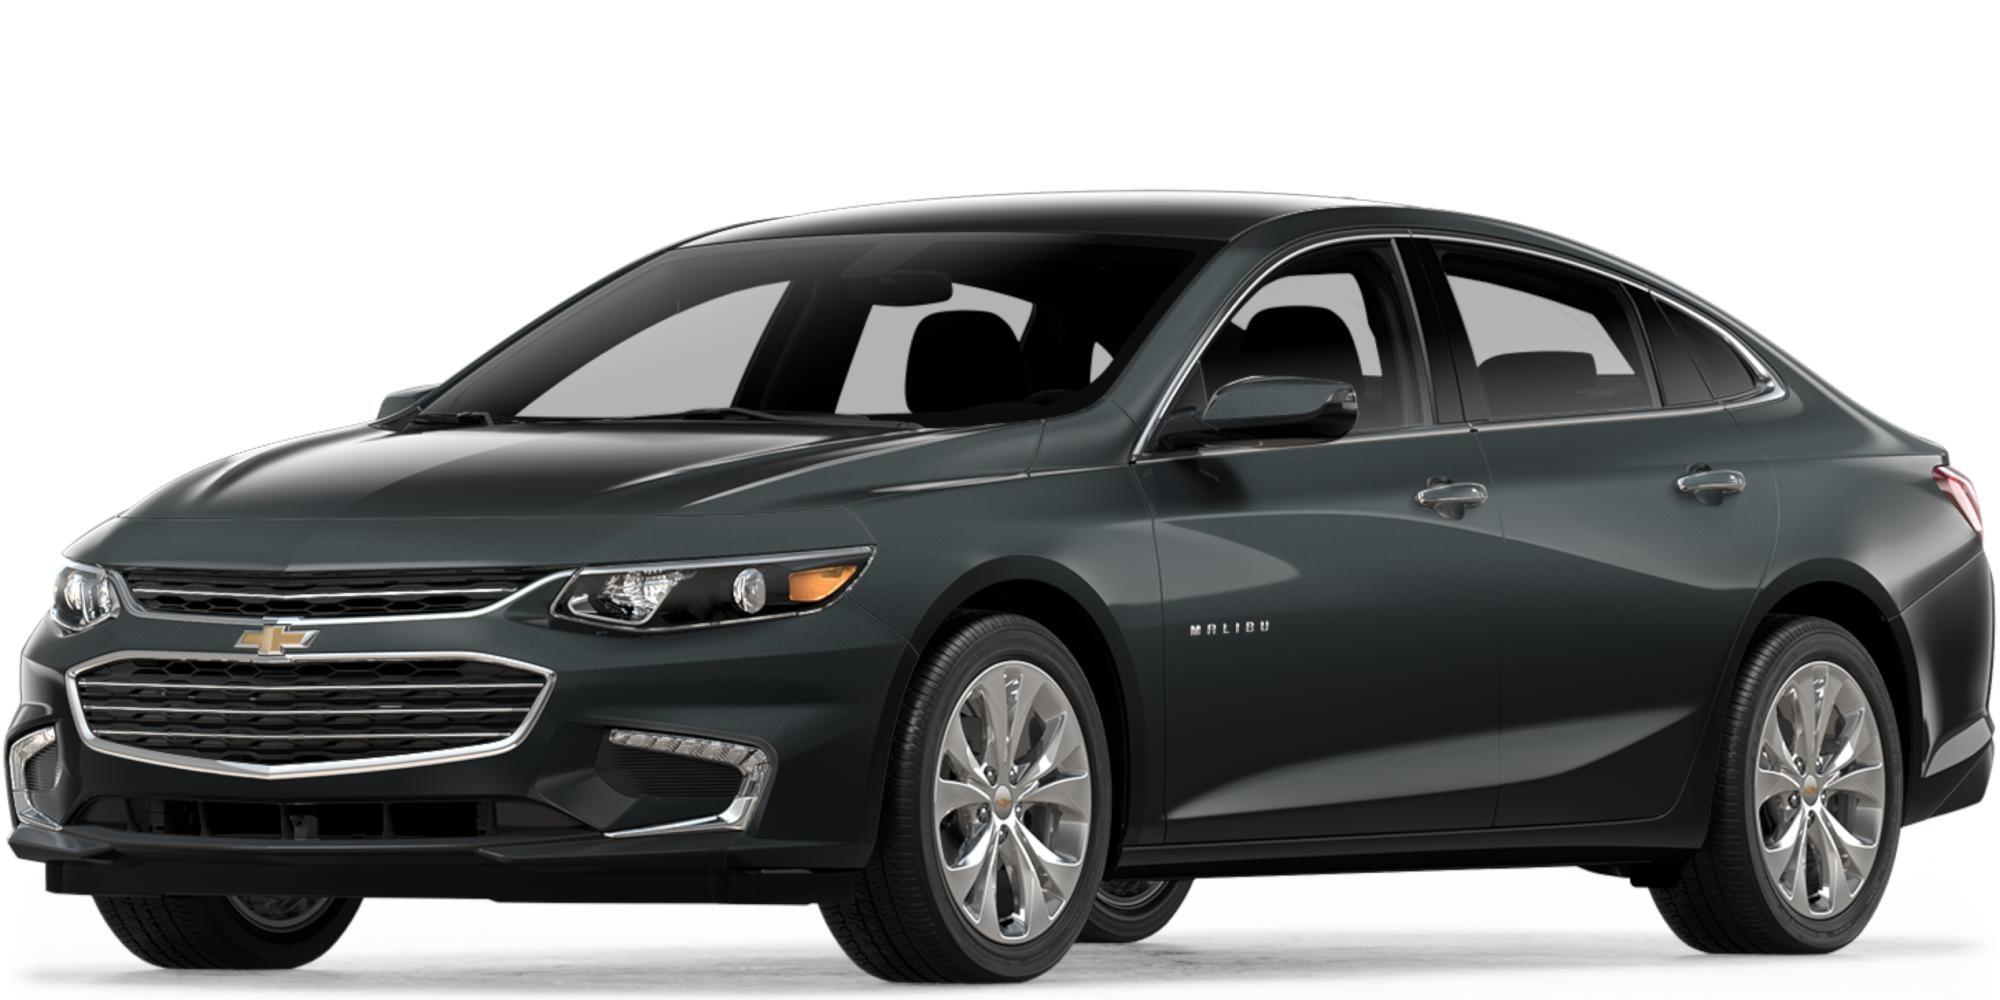 2018 Chevrolet Malibu for sale near Sacramento | John L ...